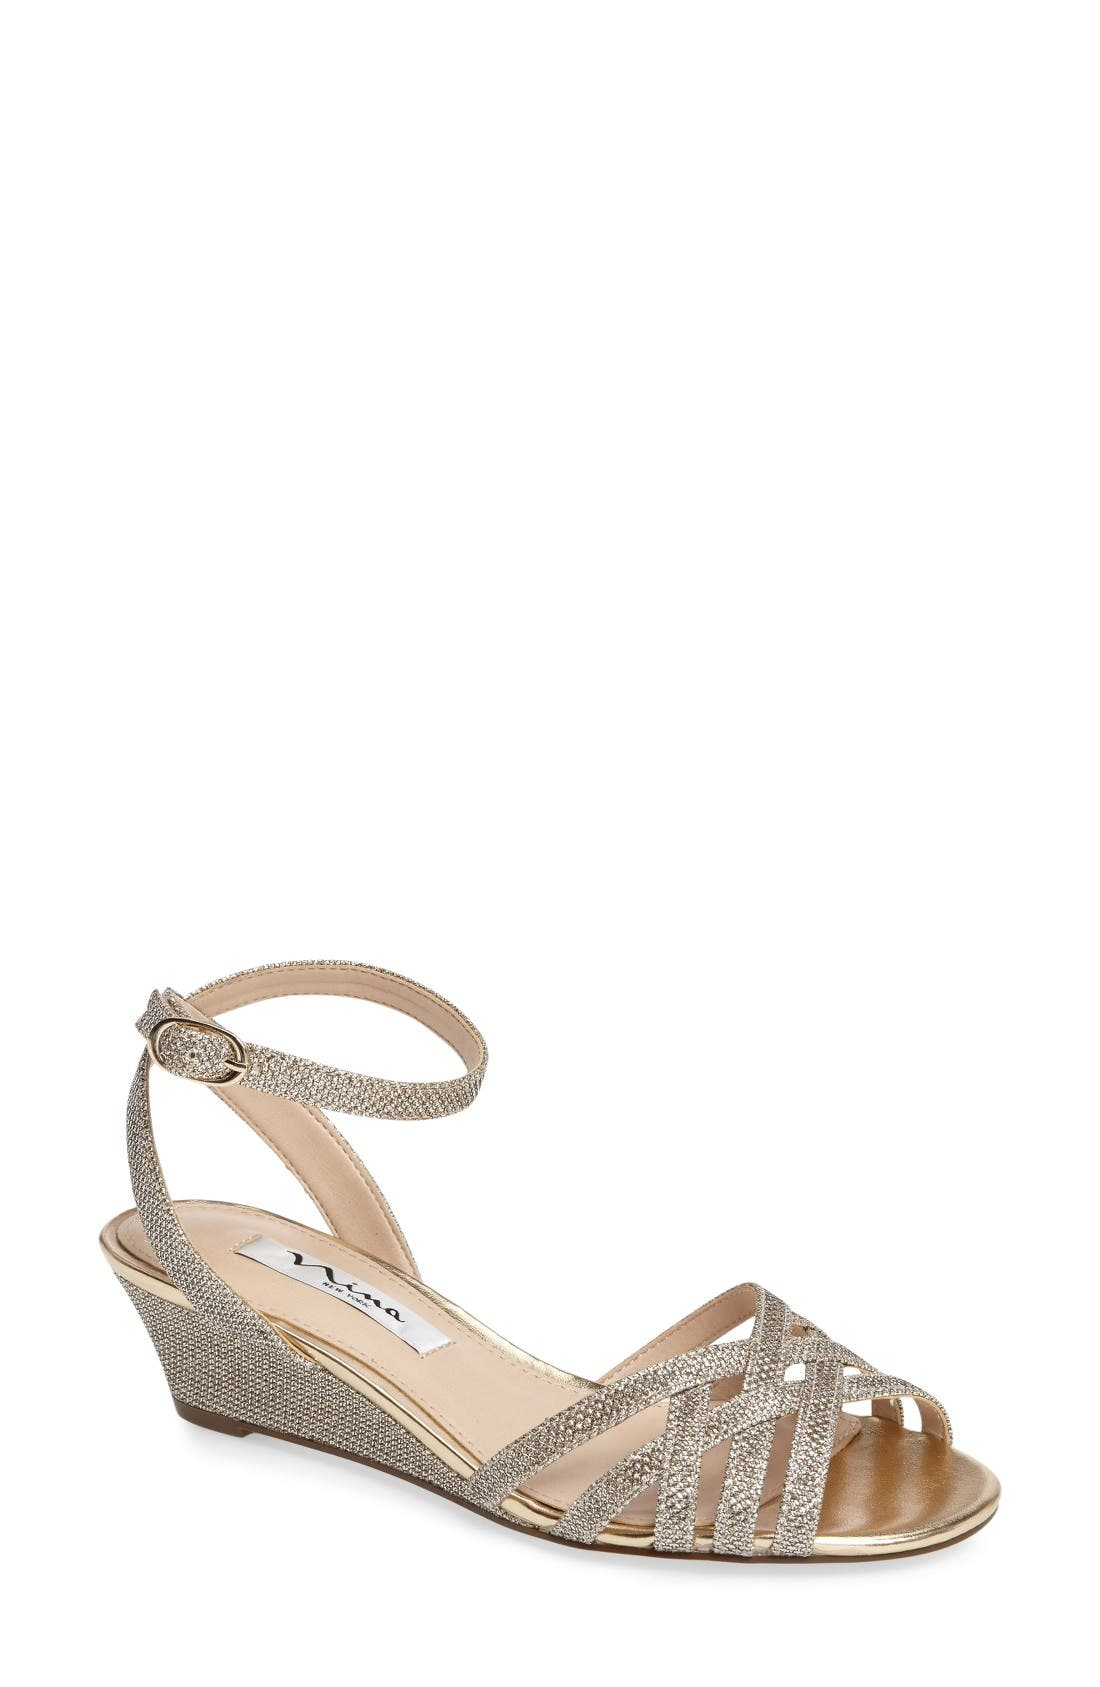 NINA Faria Ankle Strap Sandal